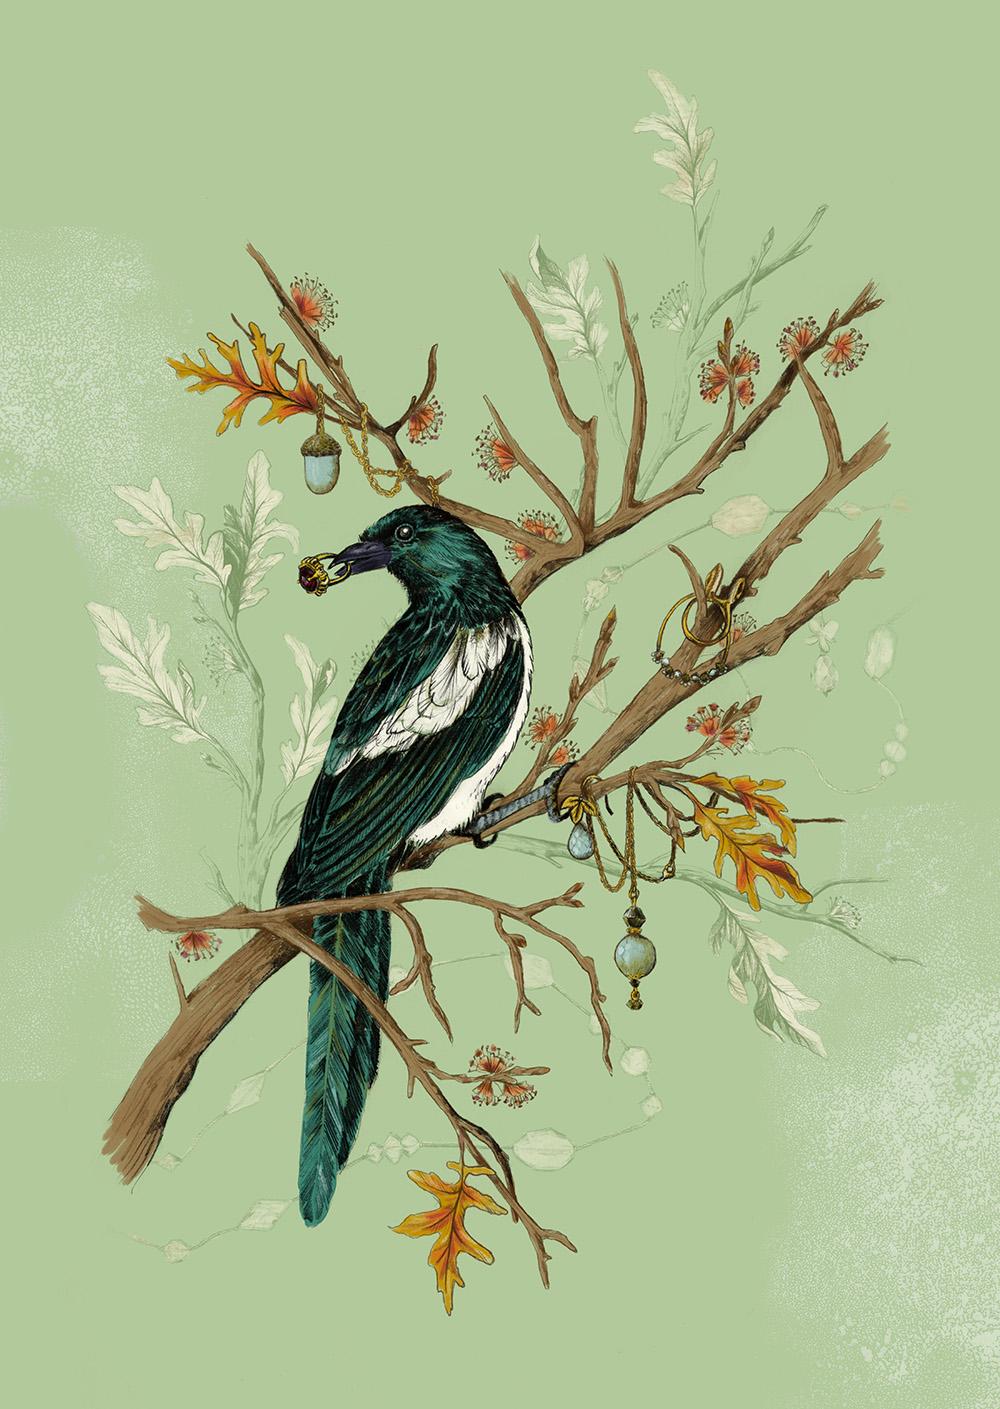 """Magpie Jewels"" by La Scarlatte (Pauline Teunissen)"